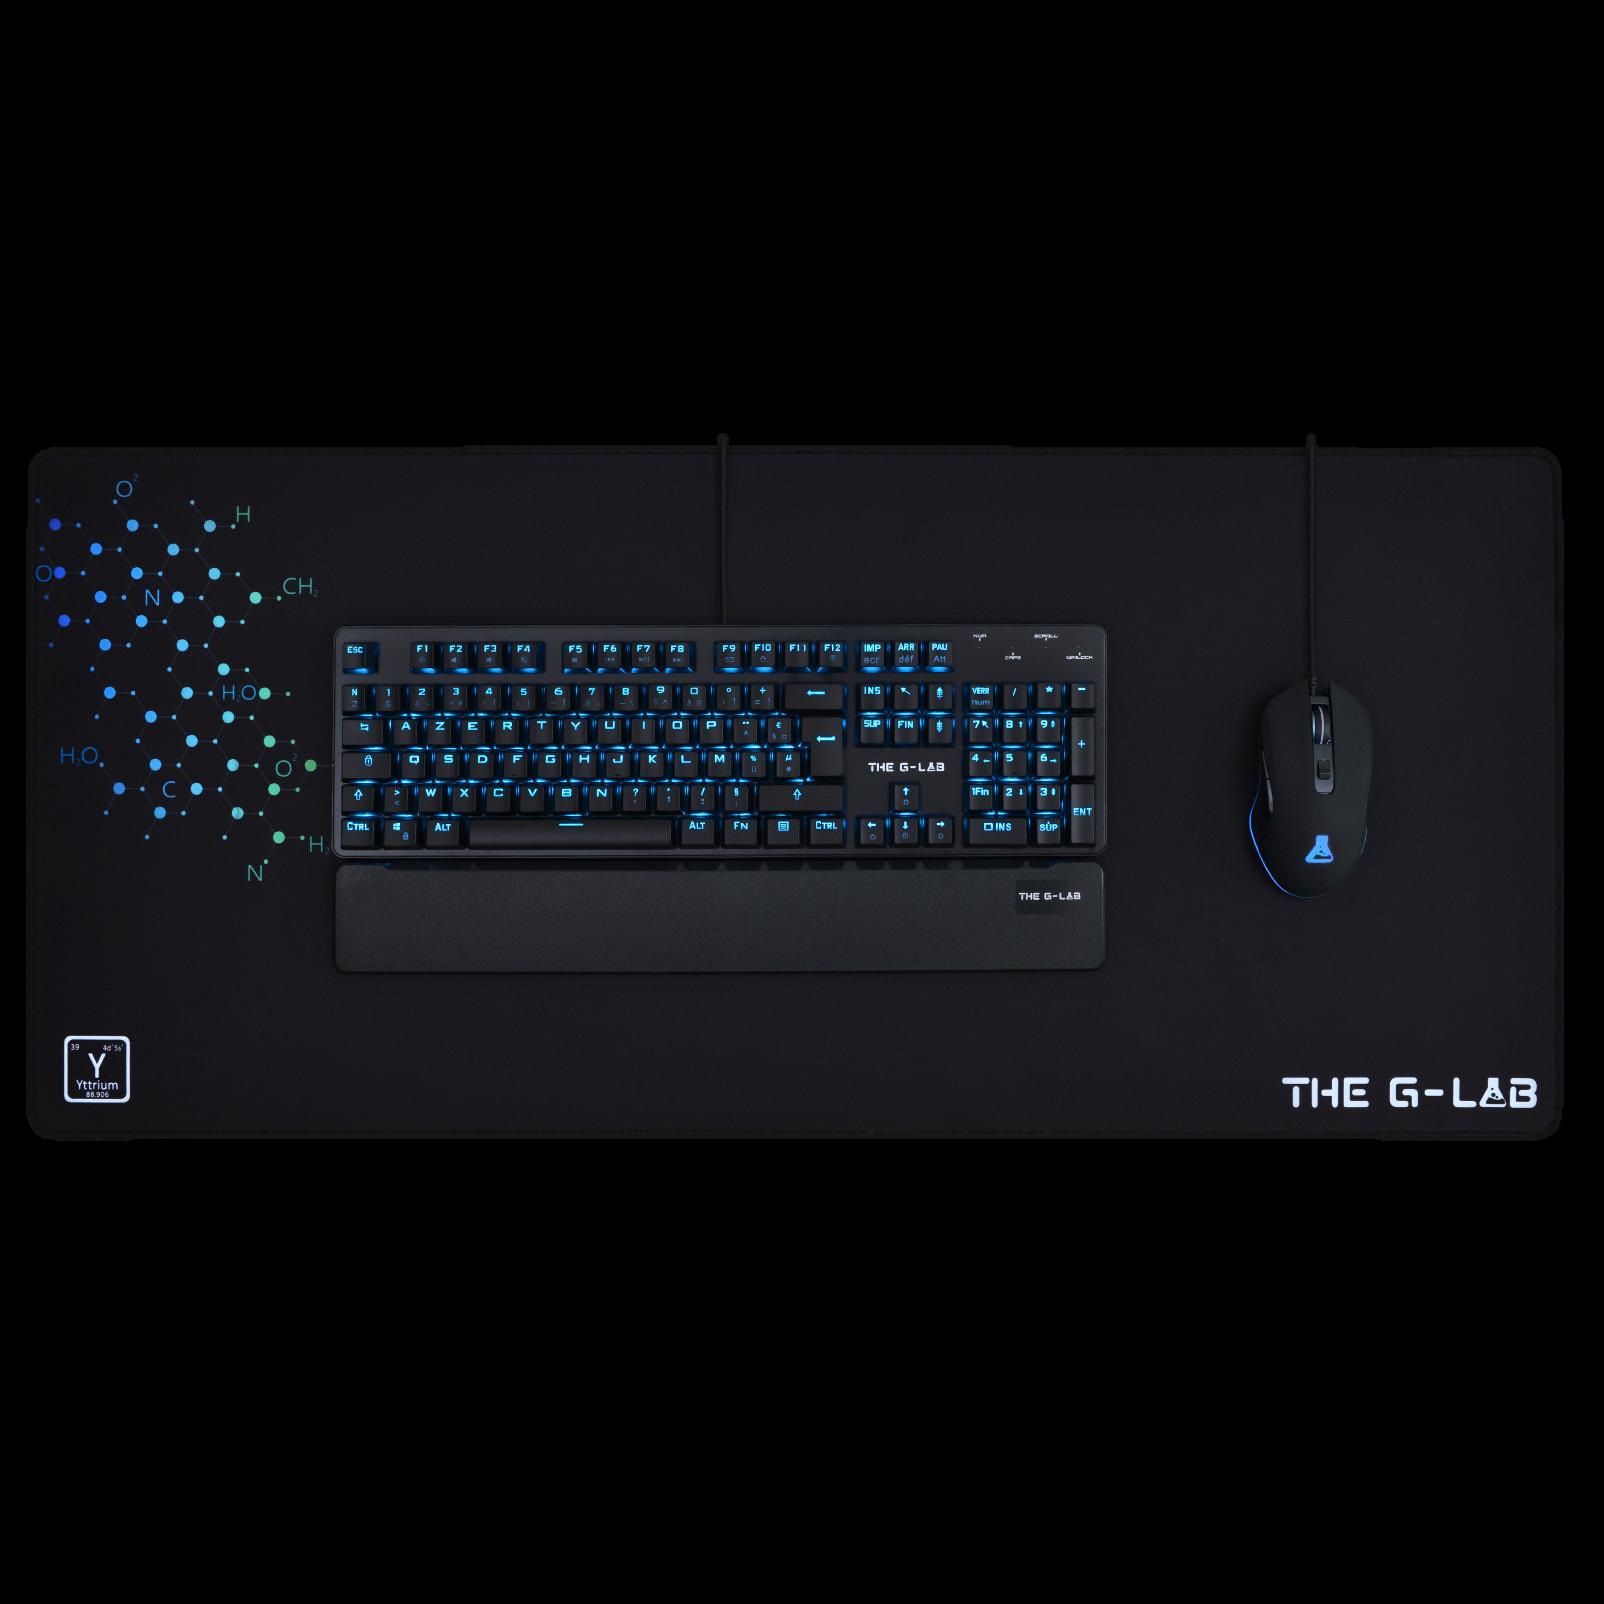 The G-LAB - Gaming Mouse Pad XXL 900x400mm - Tapis de souris - 1